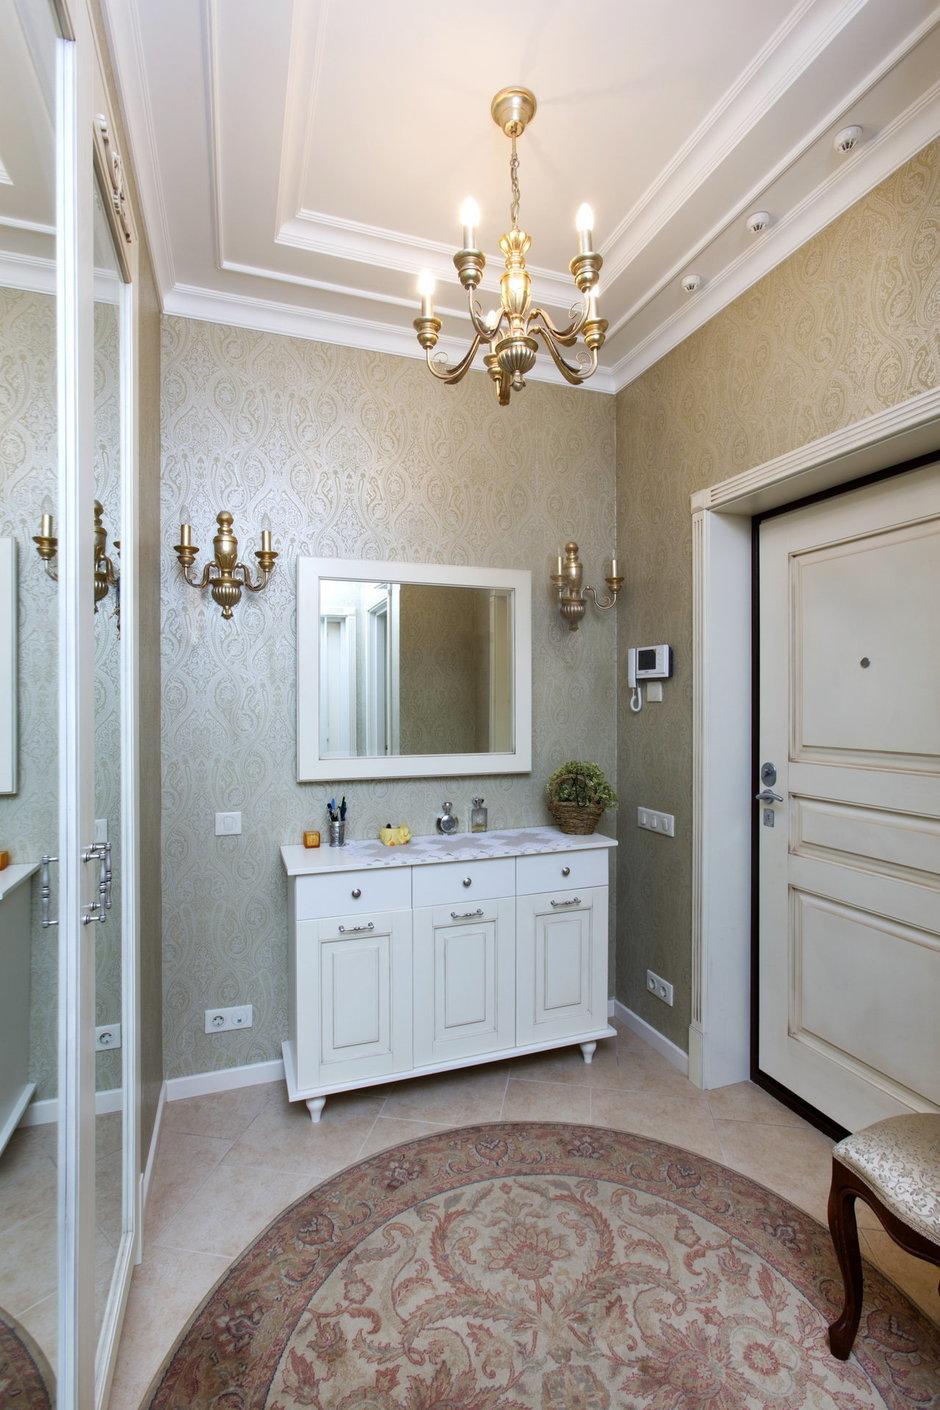 Фотография: Прихожая в стиле Классический, Квартира, Дома и квартиры, Проект недели – фото на InMyRoom.ru